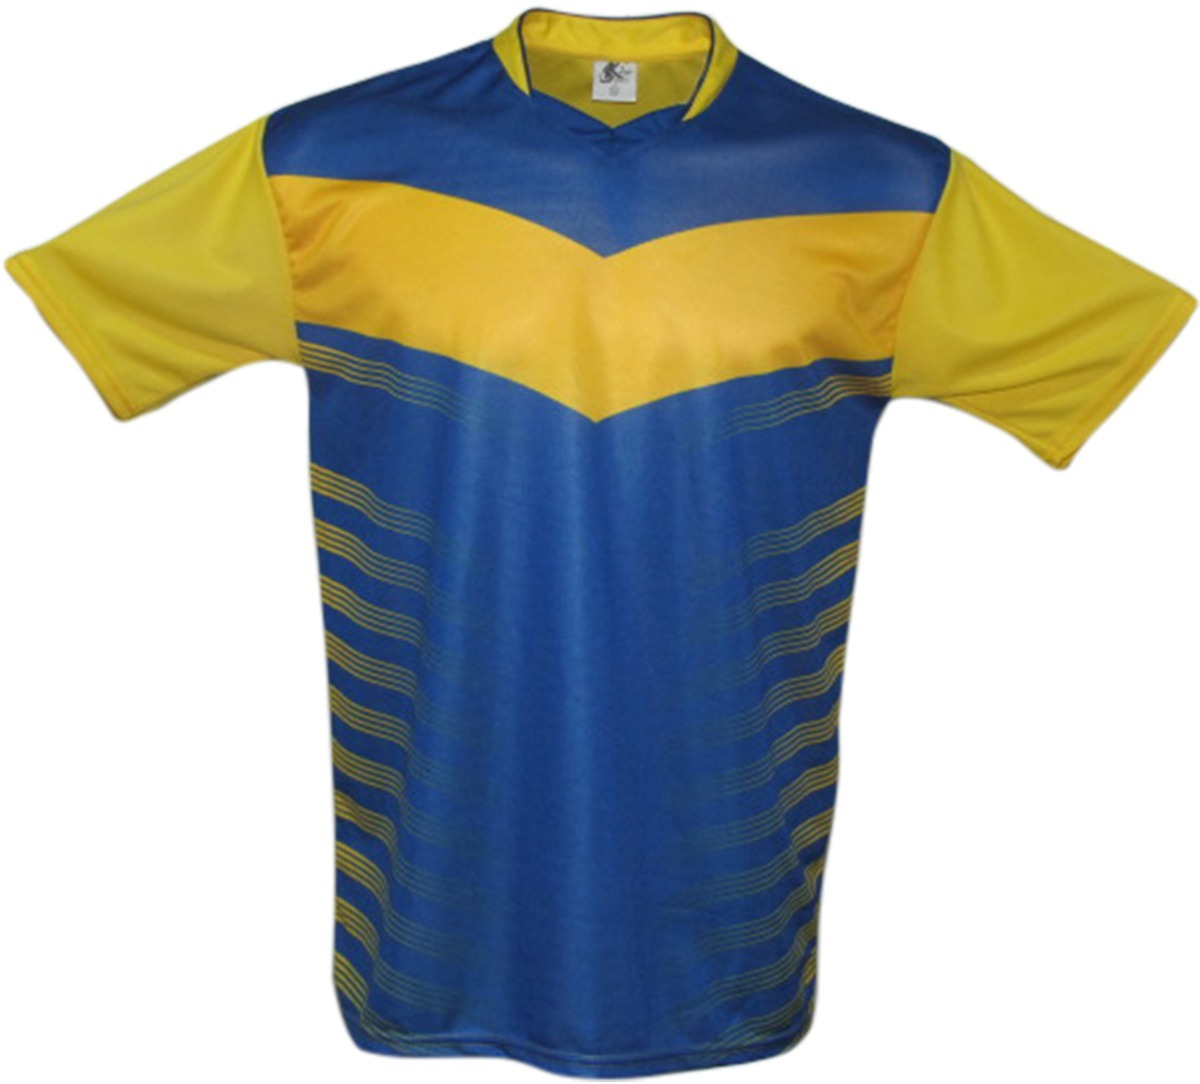 fe536e23fc Kit 5 Camisa Numerada Futebol Fardamento Uniforme Esportivo - R  140 ...